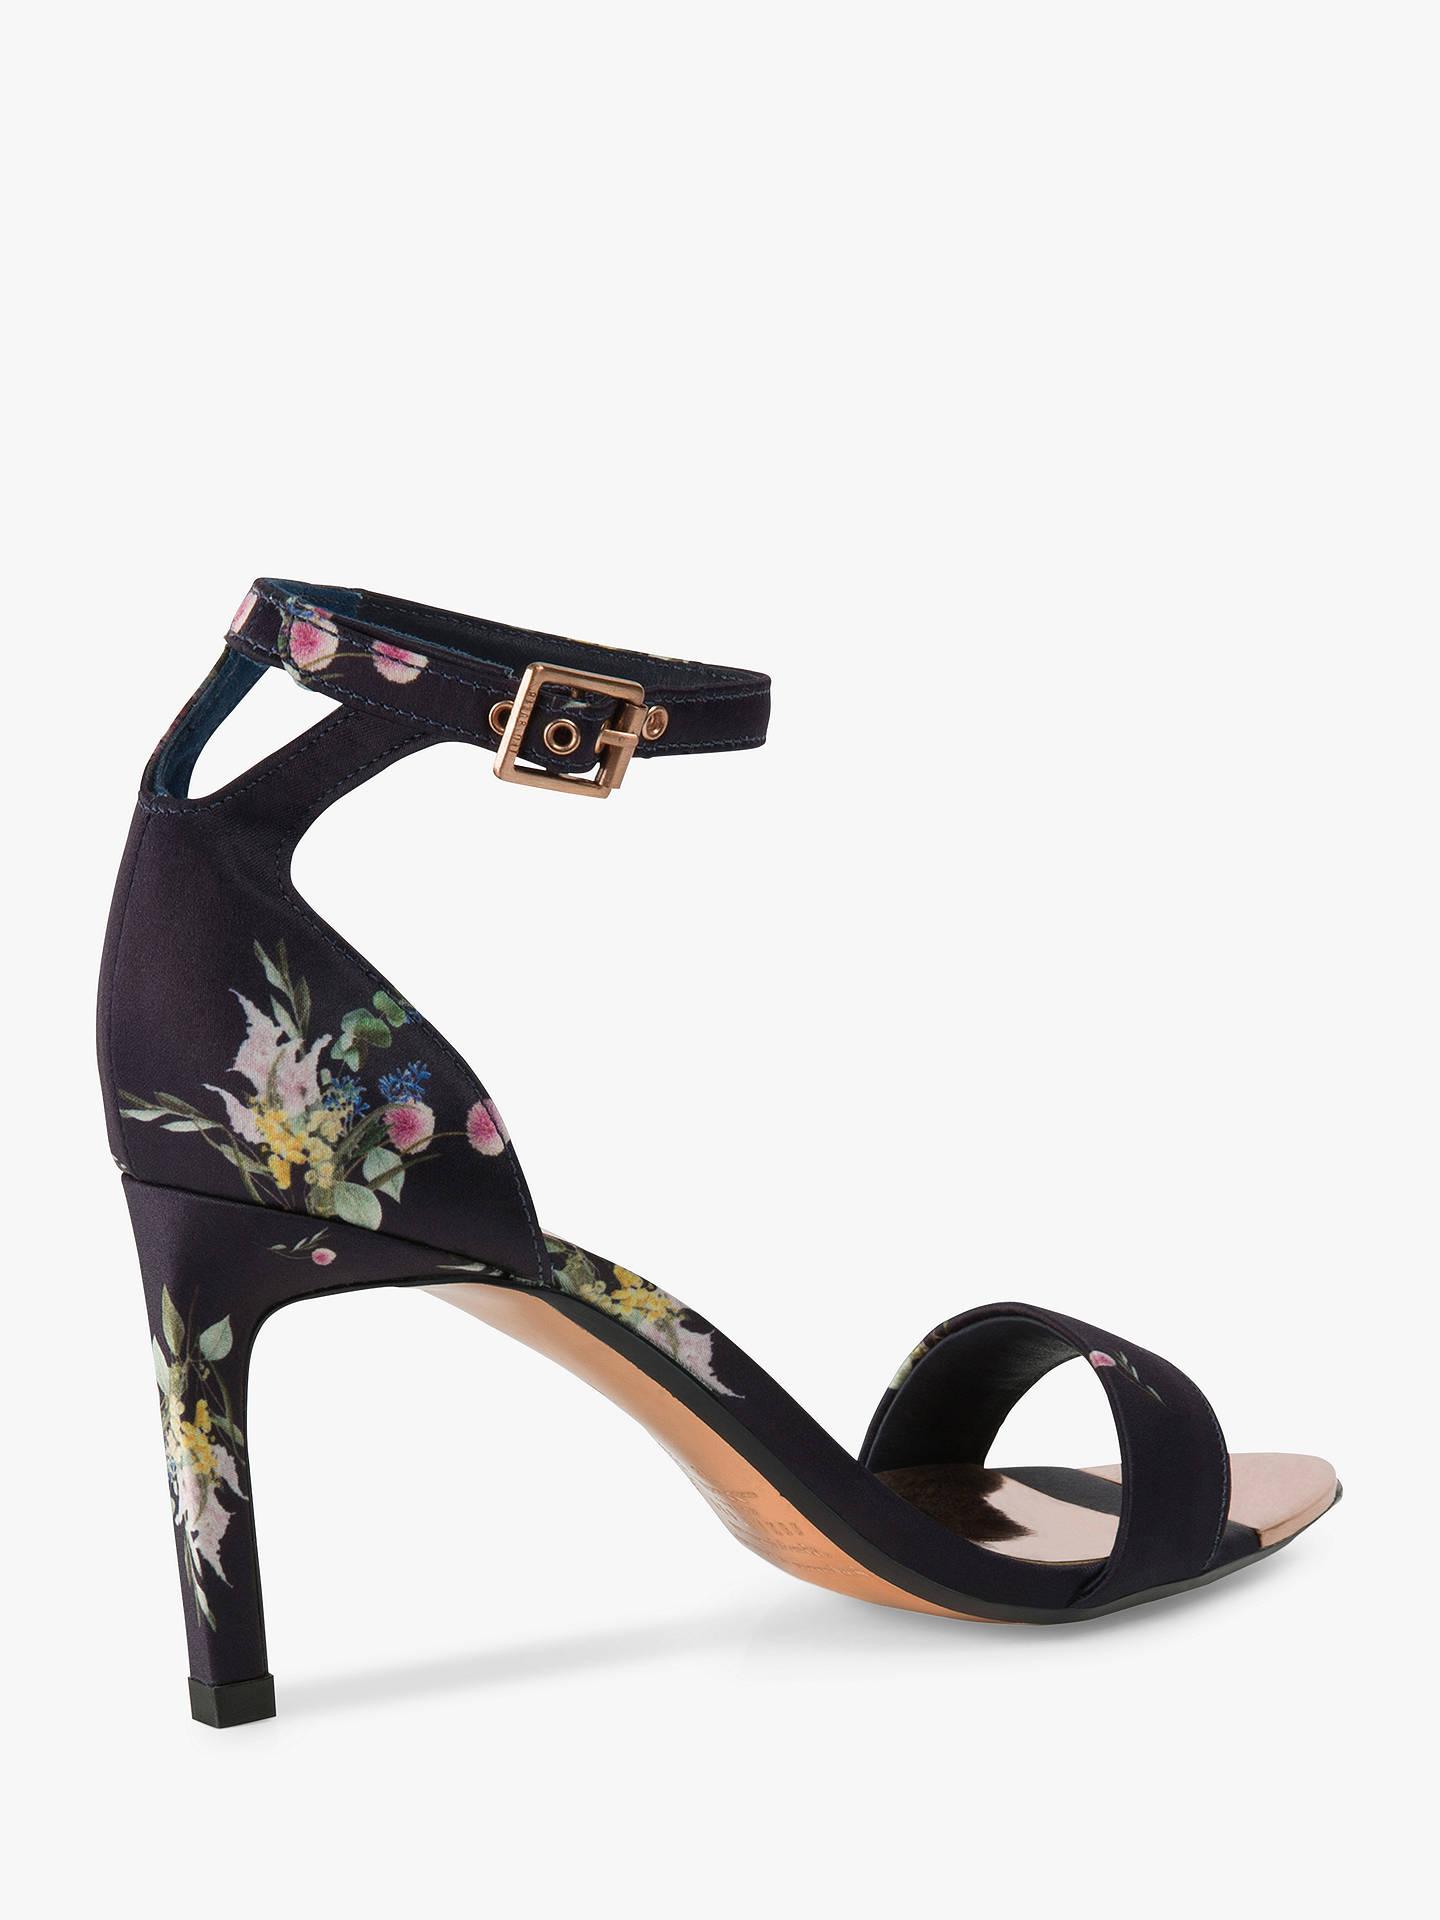 3c1249e054 ... Buy Ted Baker Ulaniip Stiletto Heel Sandals, Navy, 6 Online at  johnlewis.com